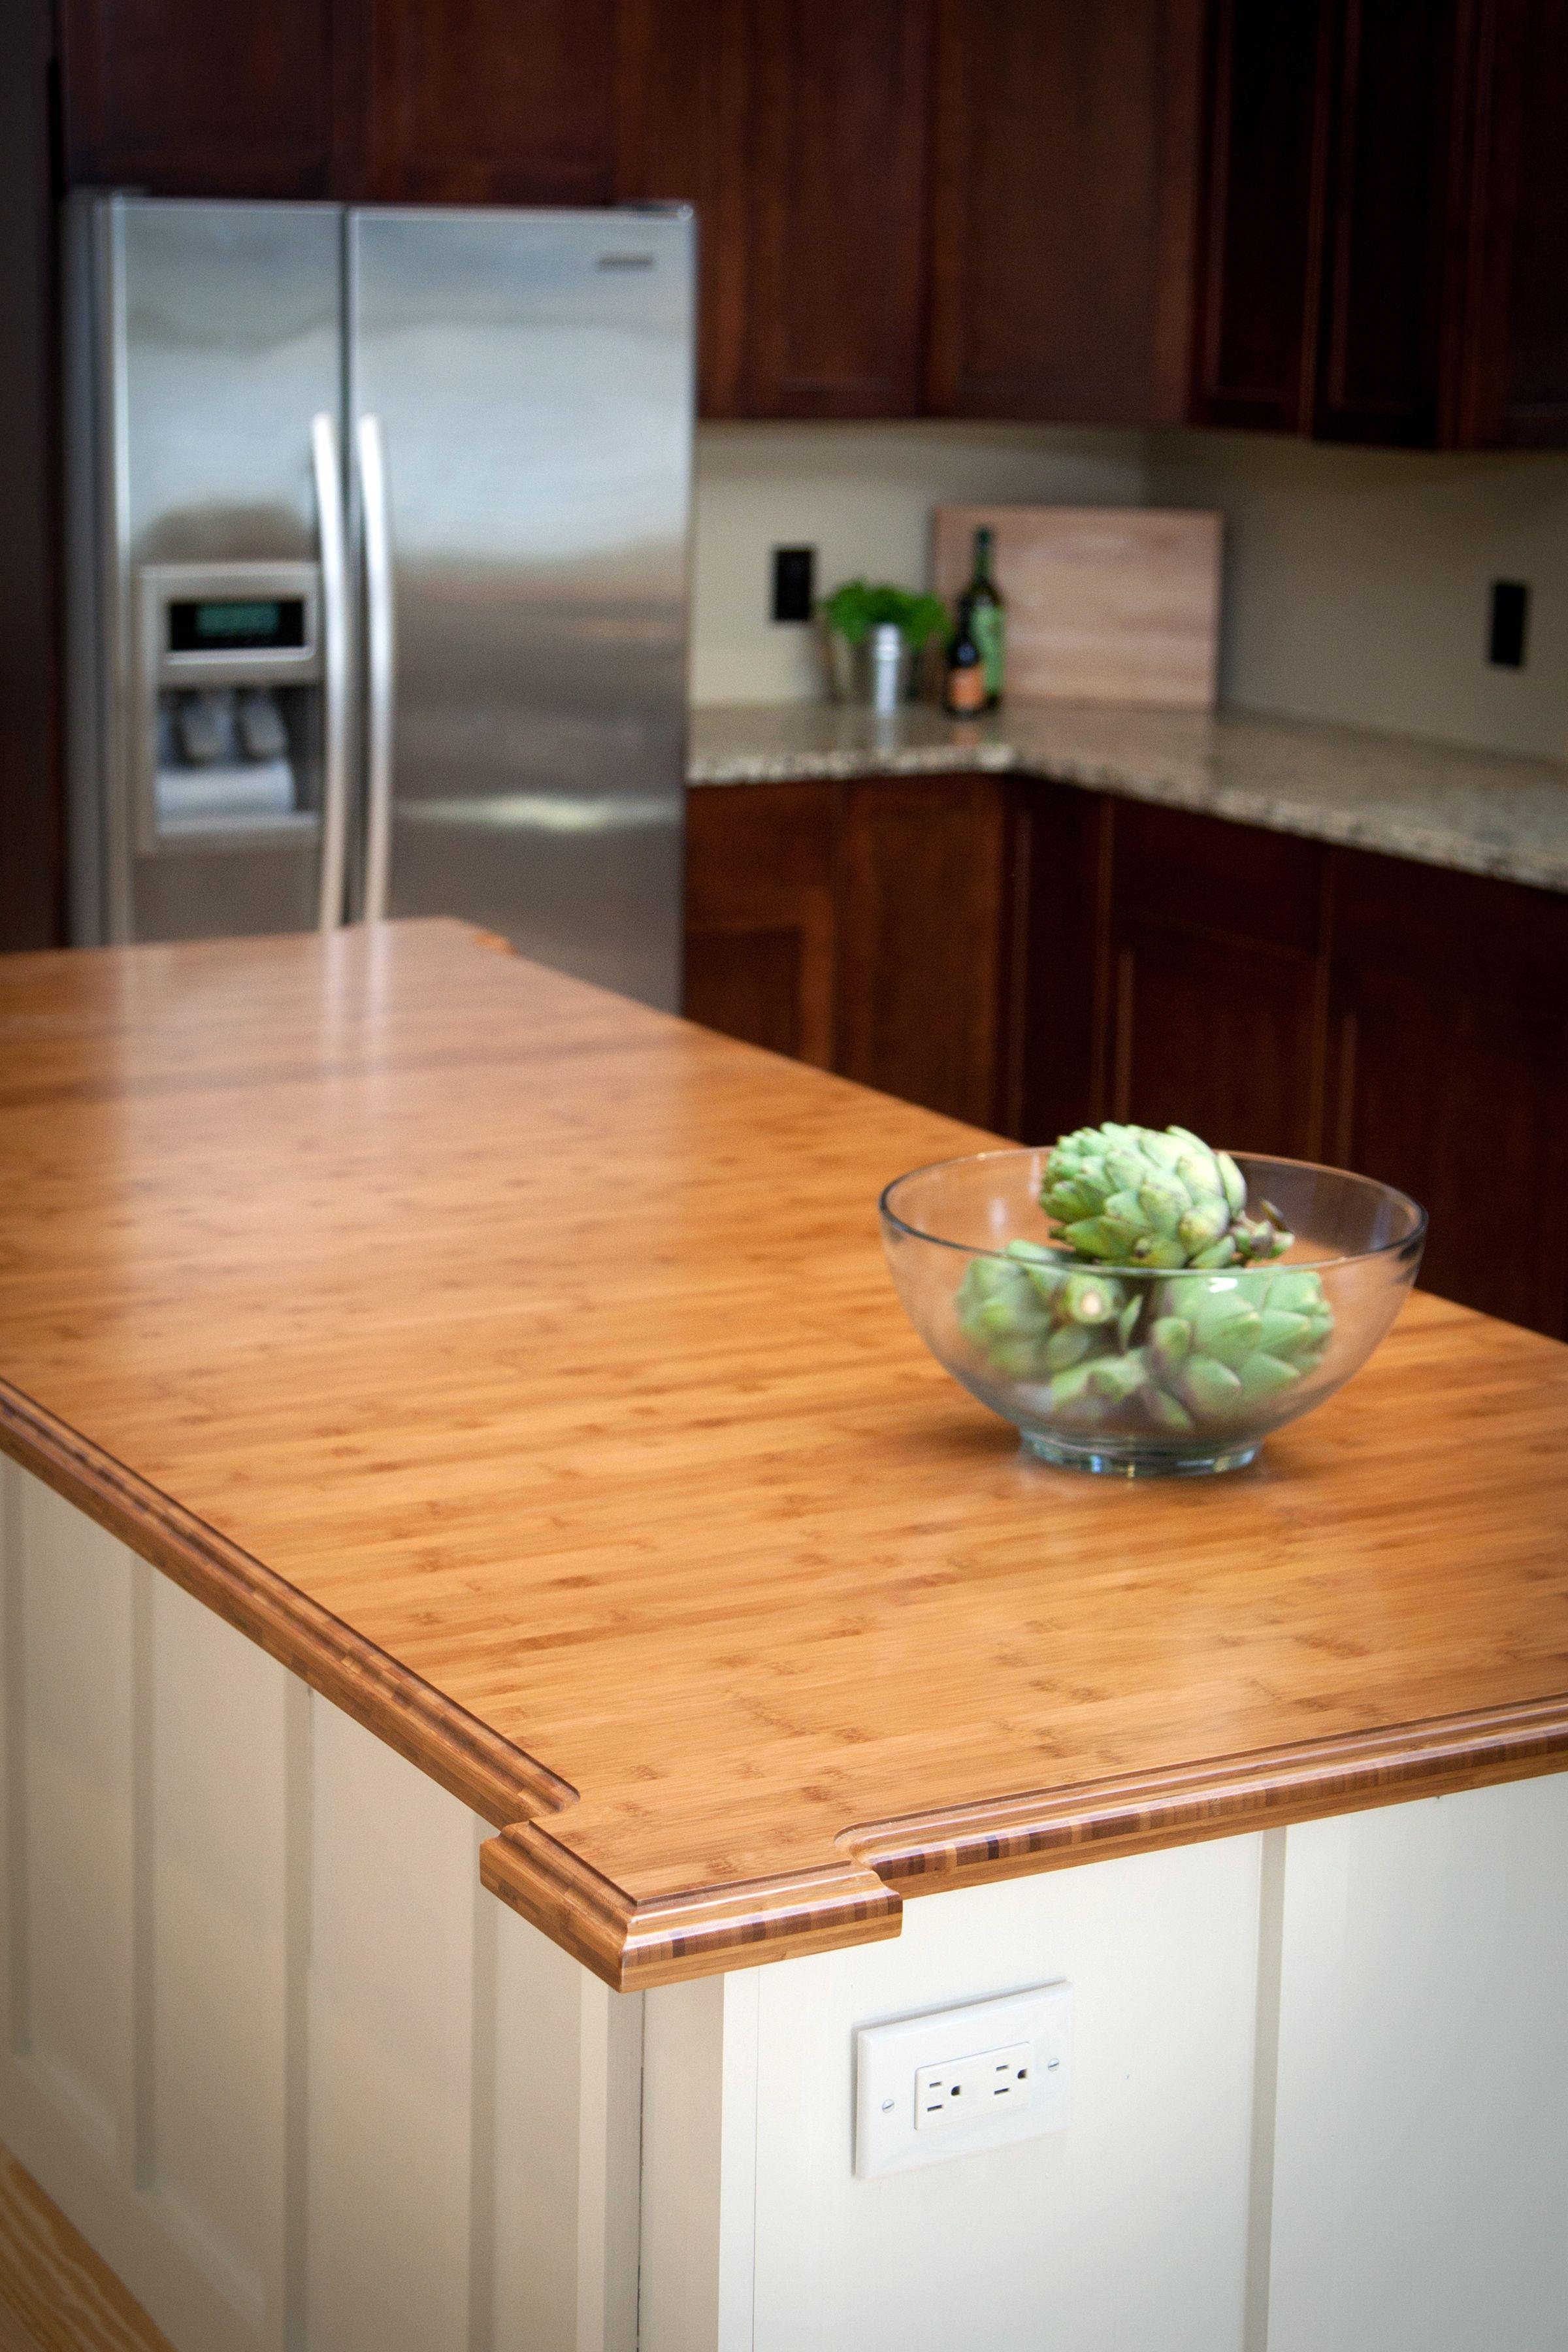 Heritage Wood Countertops In Bamboo   Eco Friendly Kitchen Countertops.  Heritage Wood Is Made By